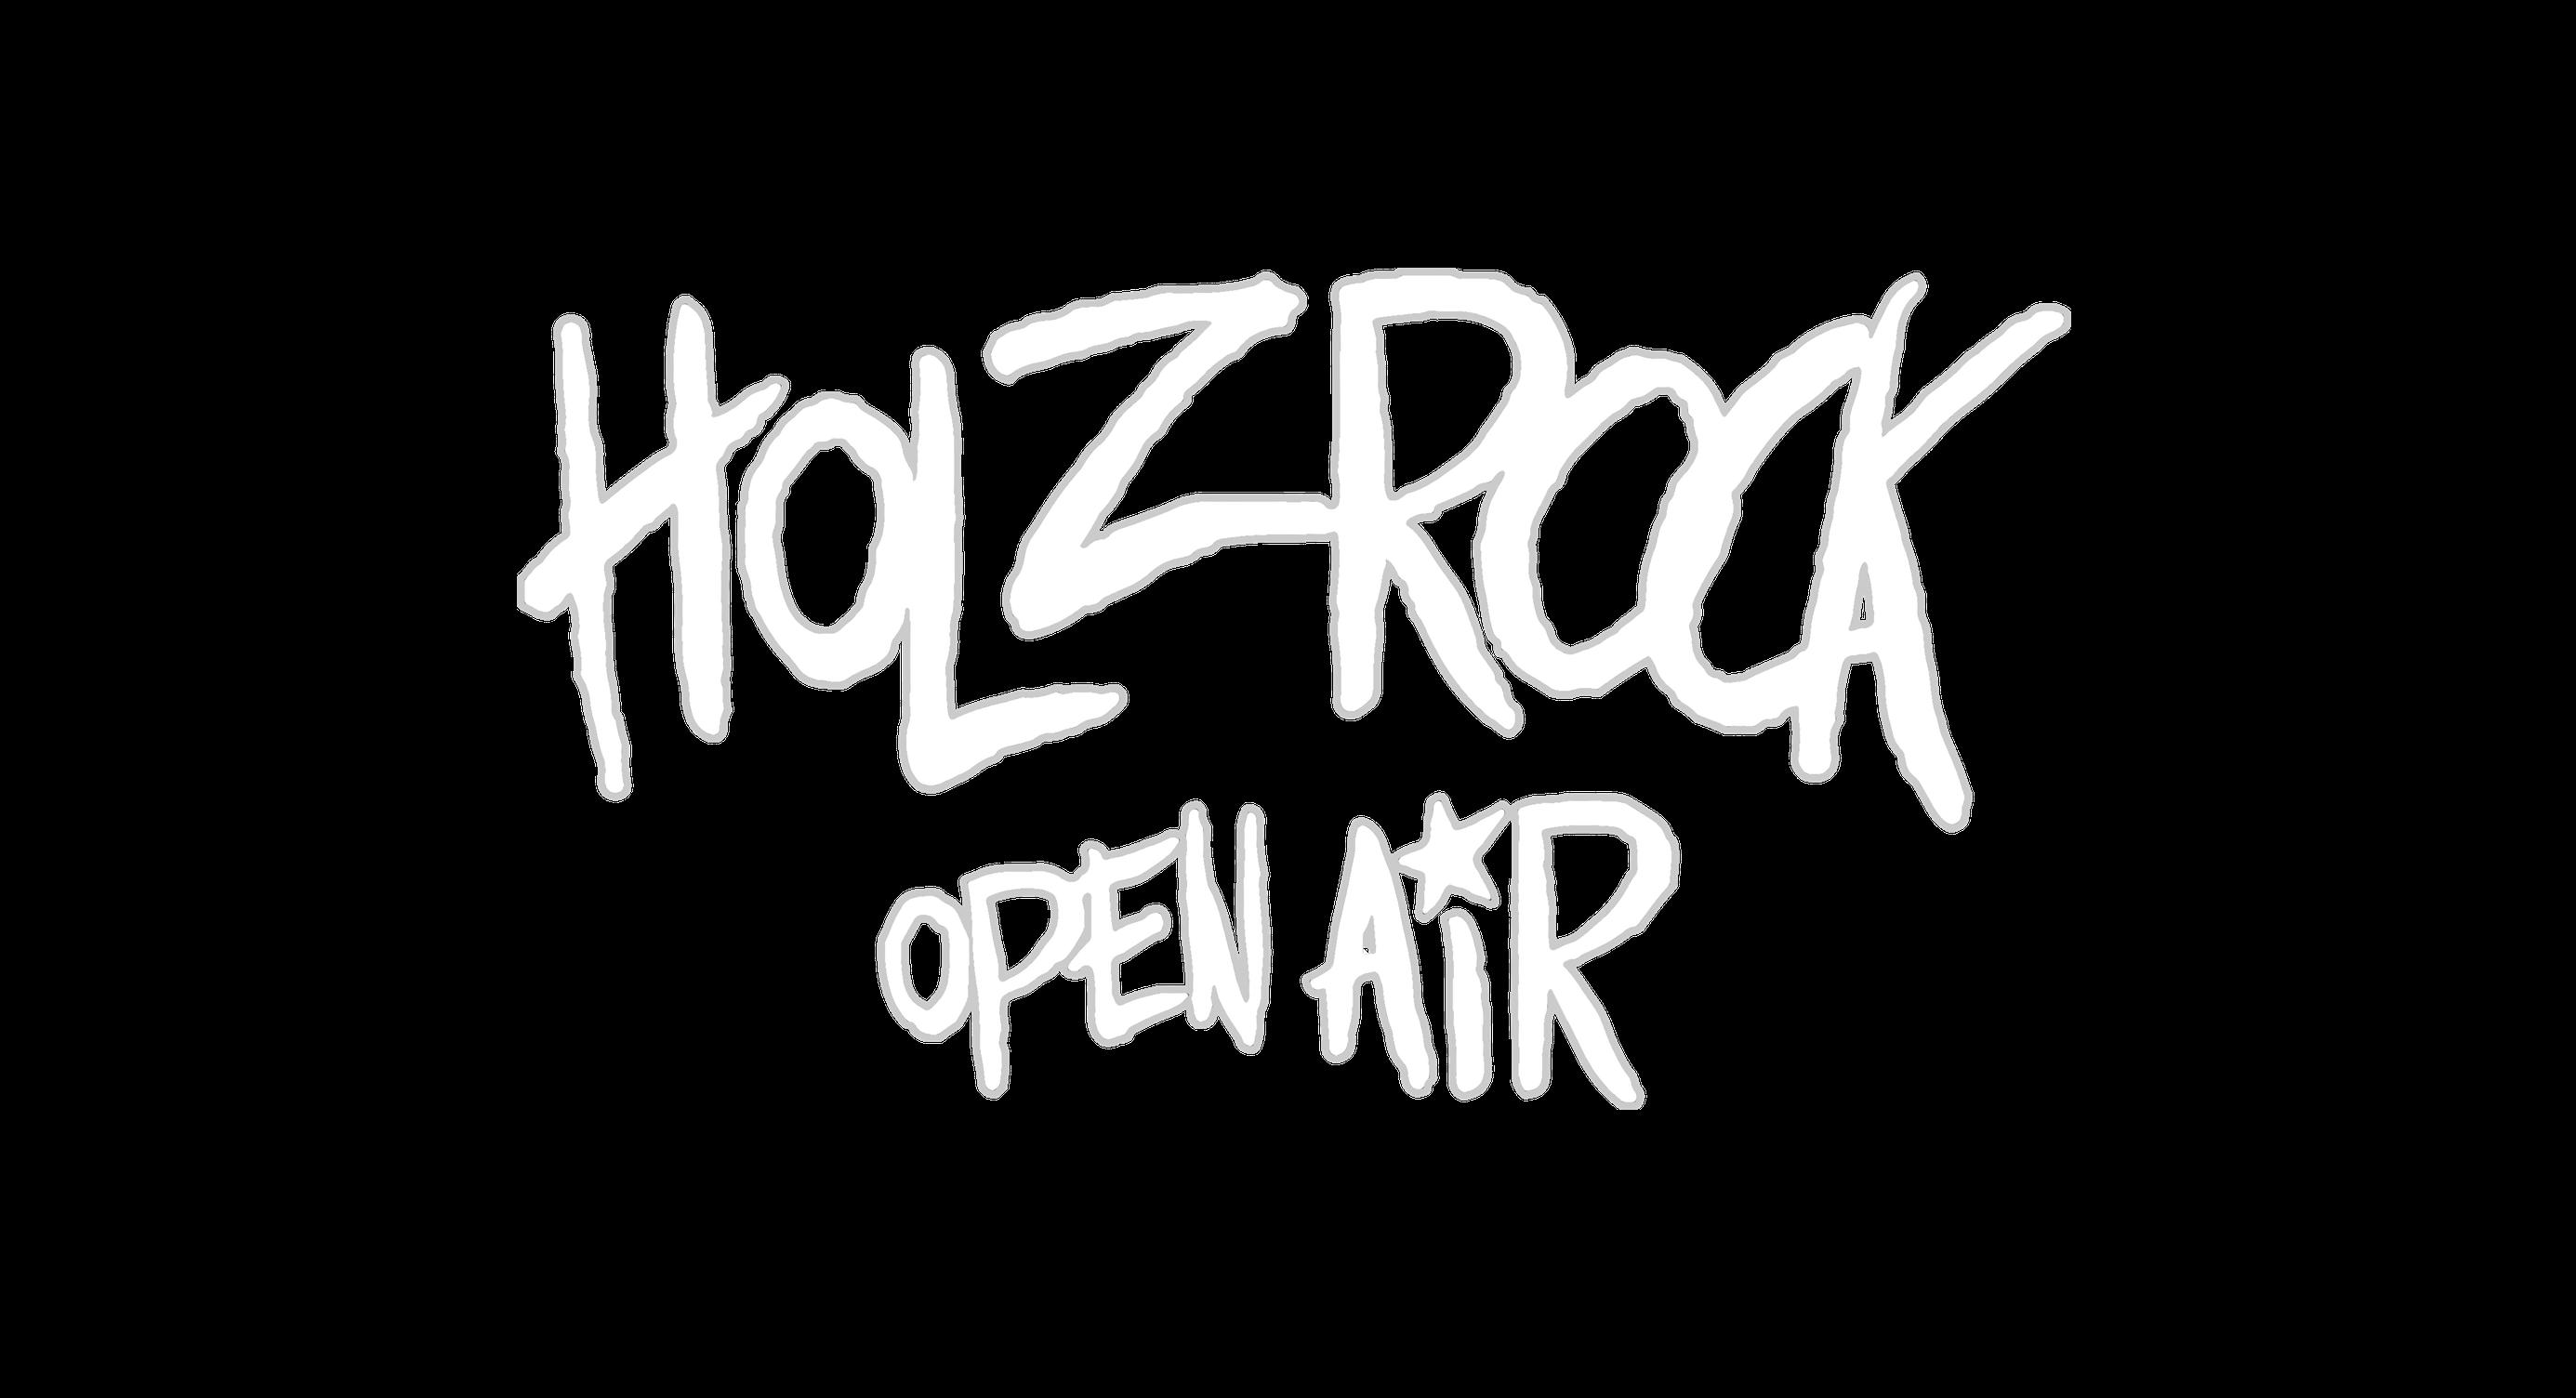 Holzrock Open Air Festival